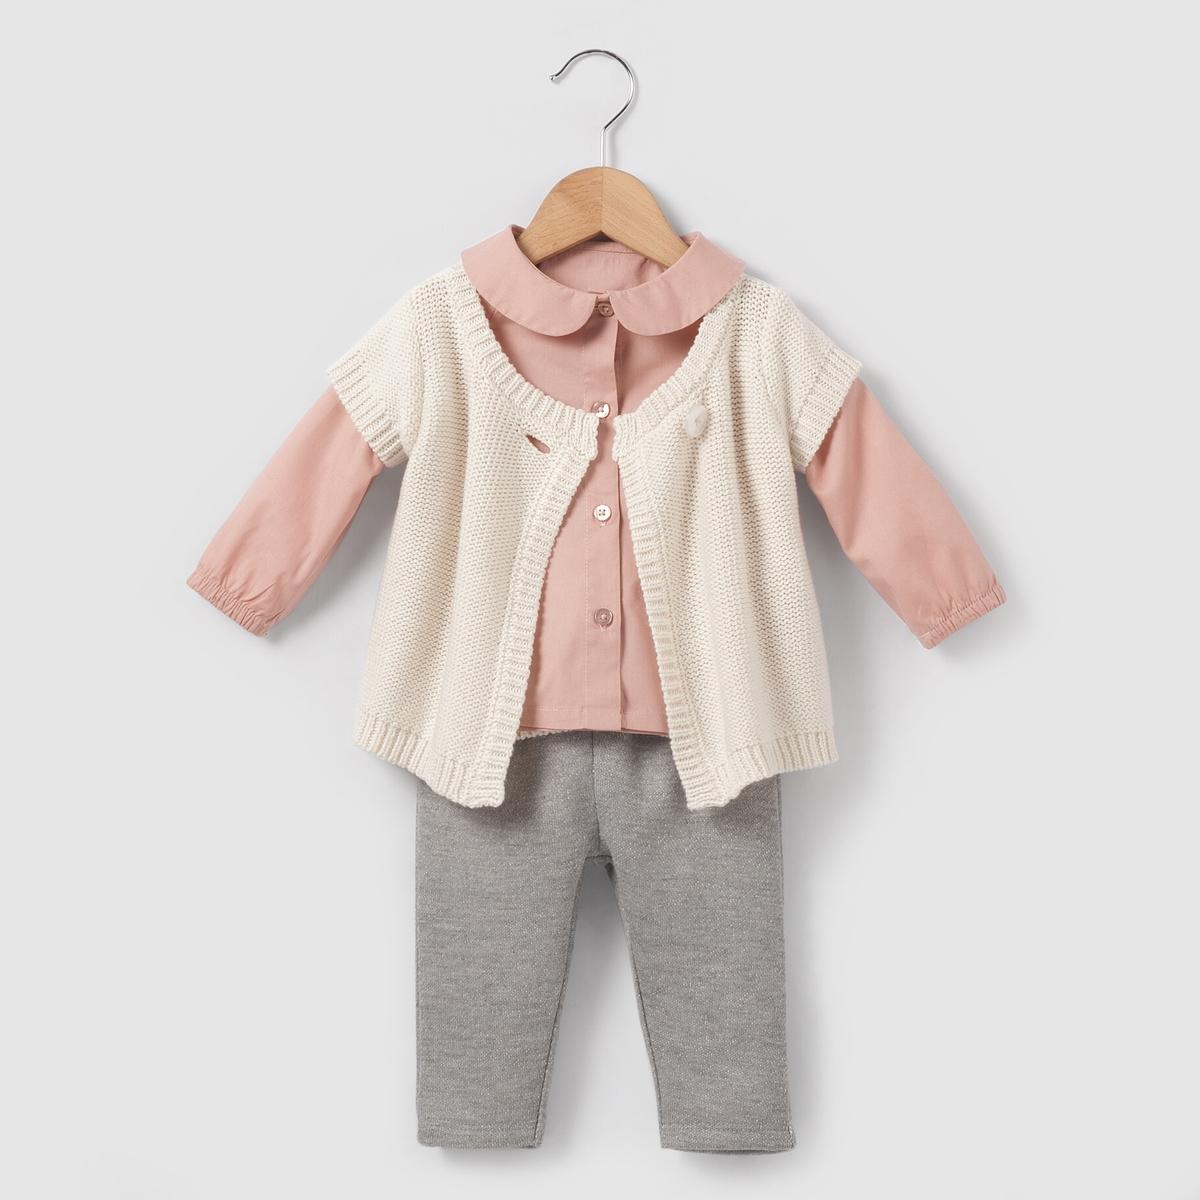 Комплект из блузки, жилета и штанишек 1 мес-3 лет